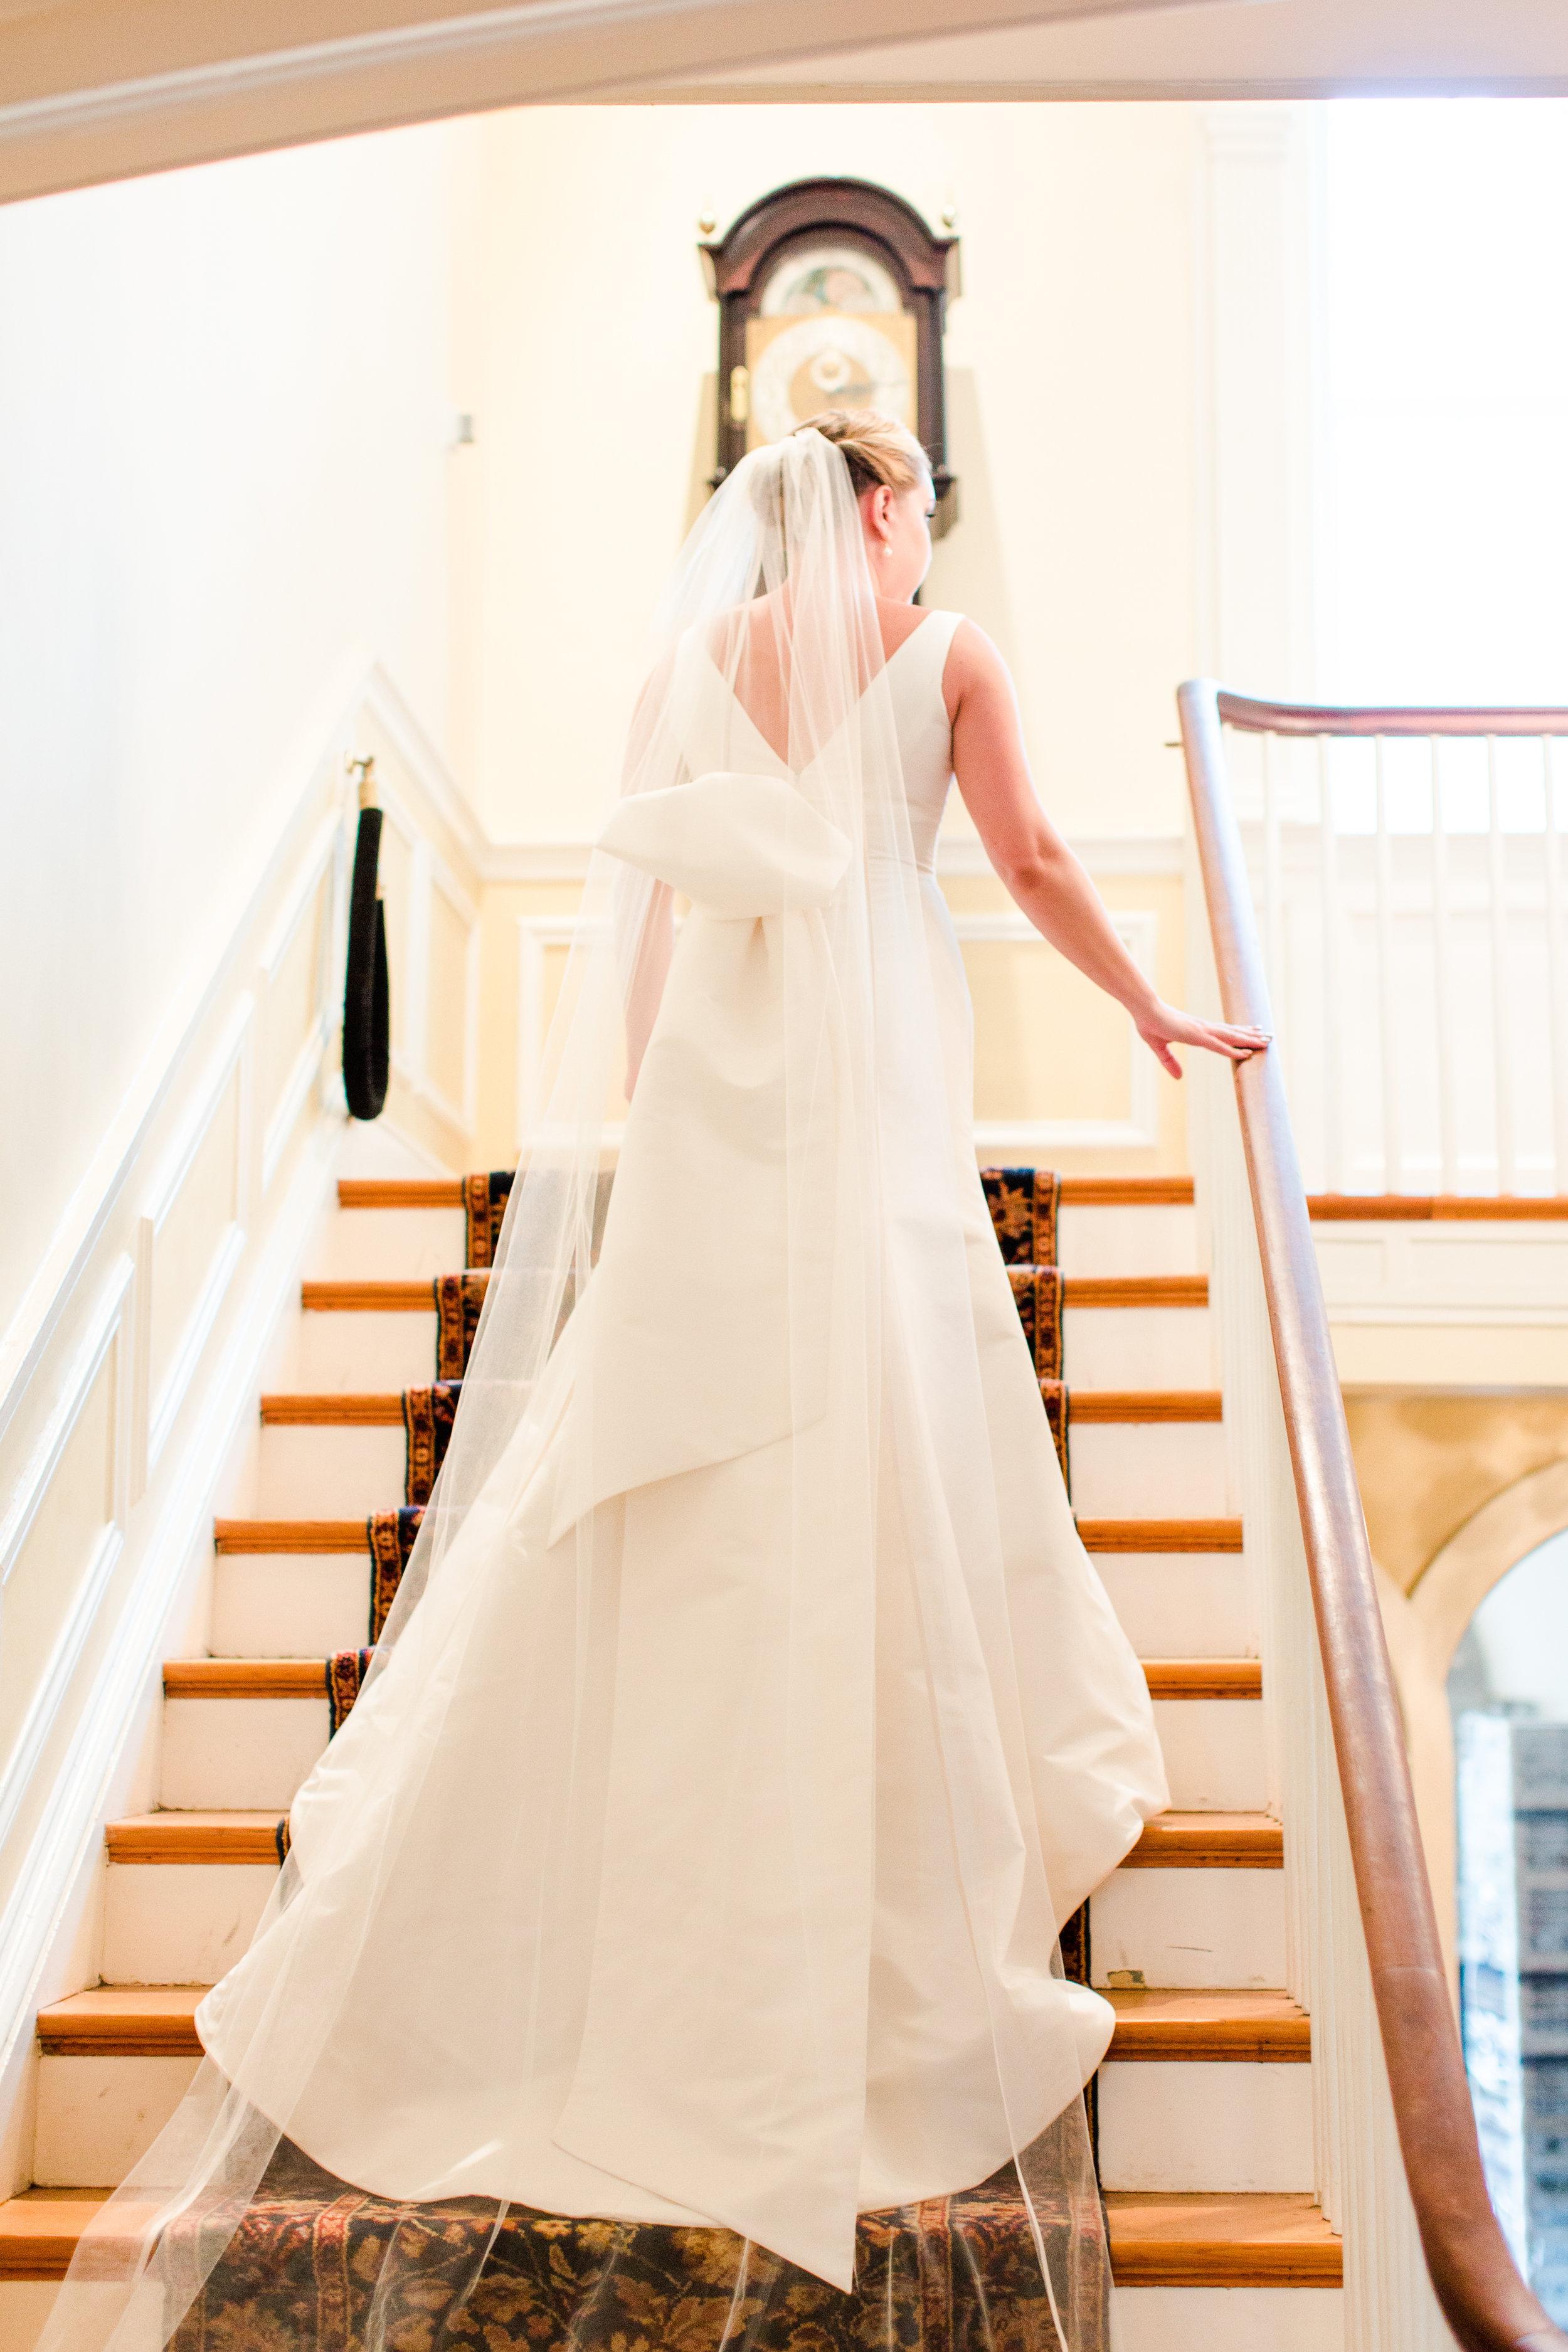 glenview-mansion-rockville-maryland-bourbon-derby-buker-wedding-bride-groom-portraitsbethanne-arthur-photography-photos-30.jpg